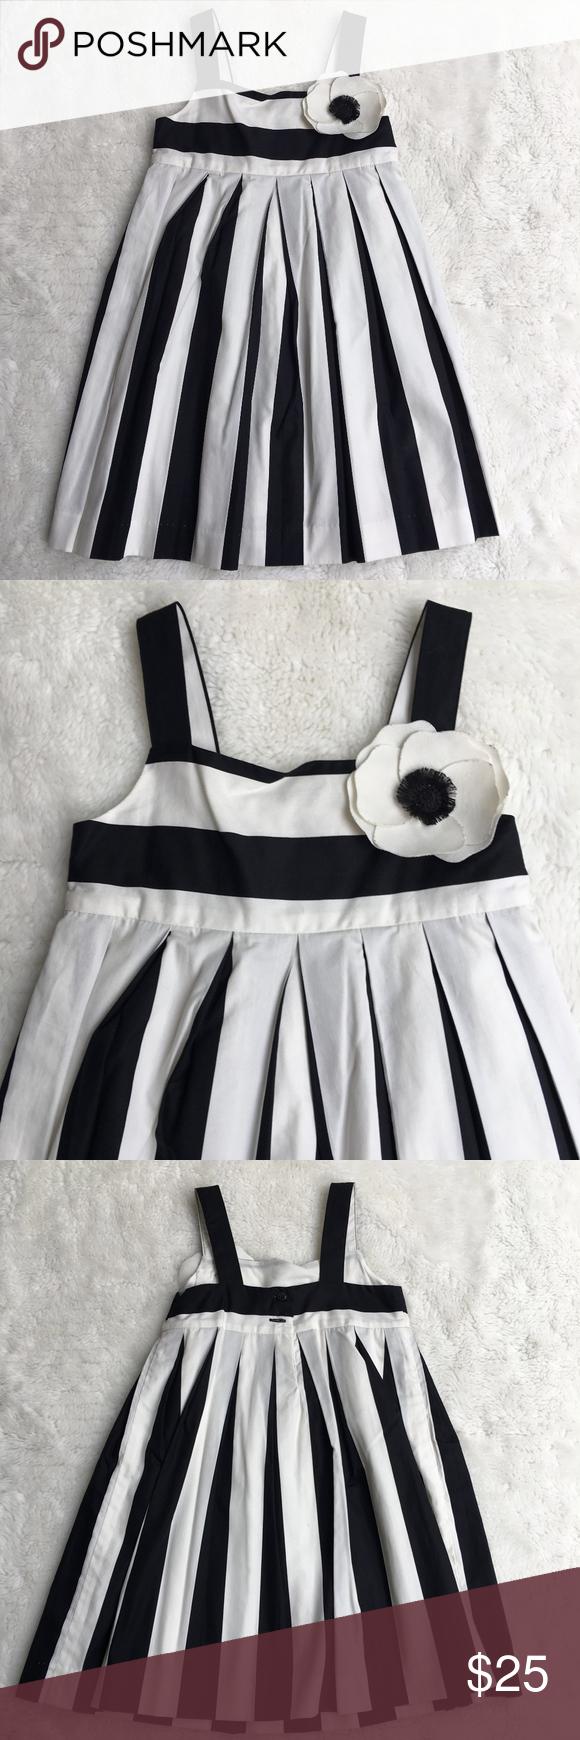 Janie Jack Black White Summer Dress Size 18 24 M White Dress Summer Summer Dresses Size 18 Dress [ 1740 x 580 Pixel ]